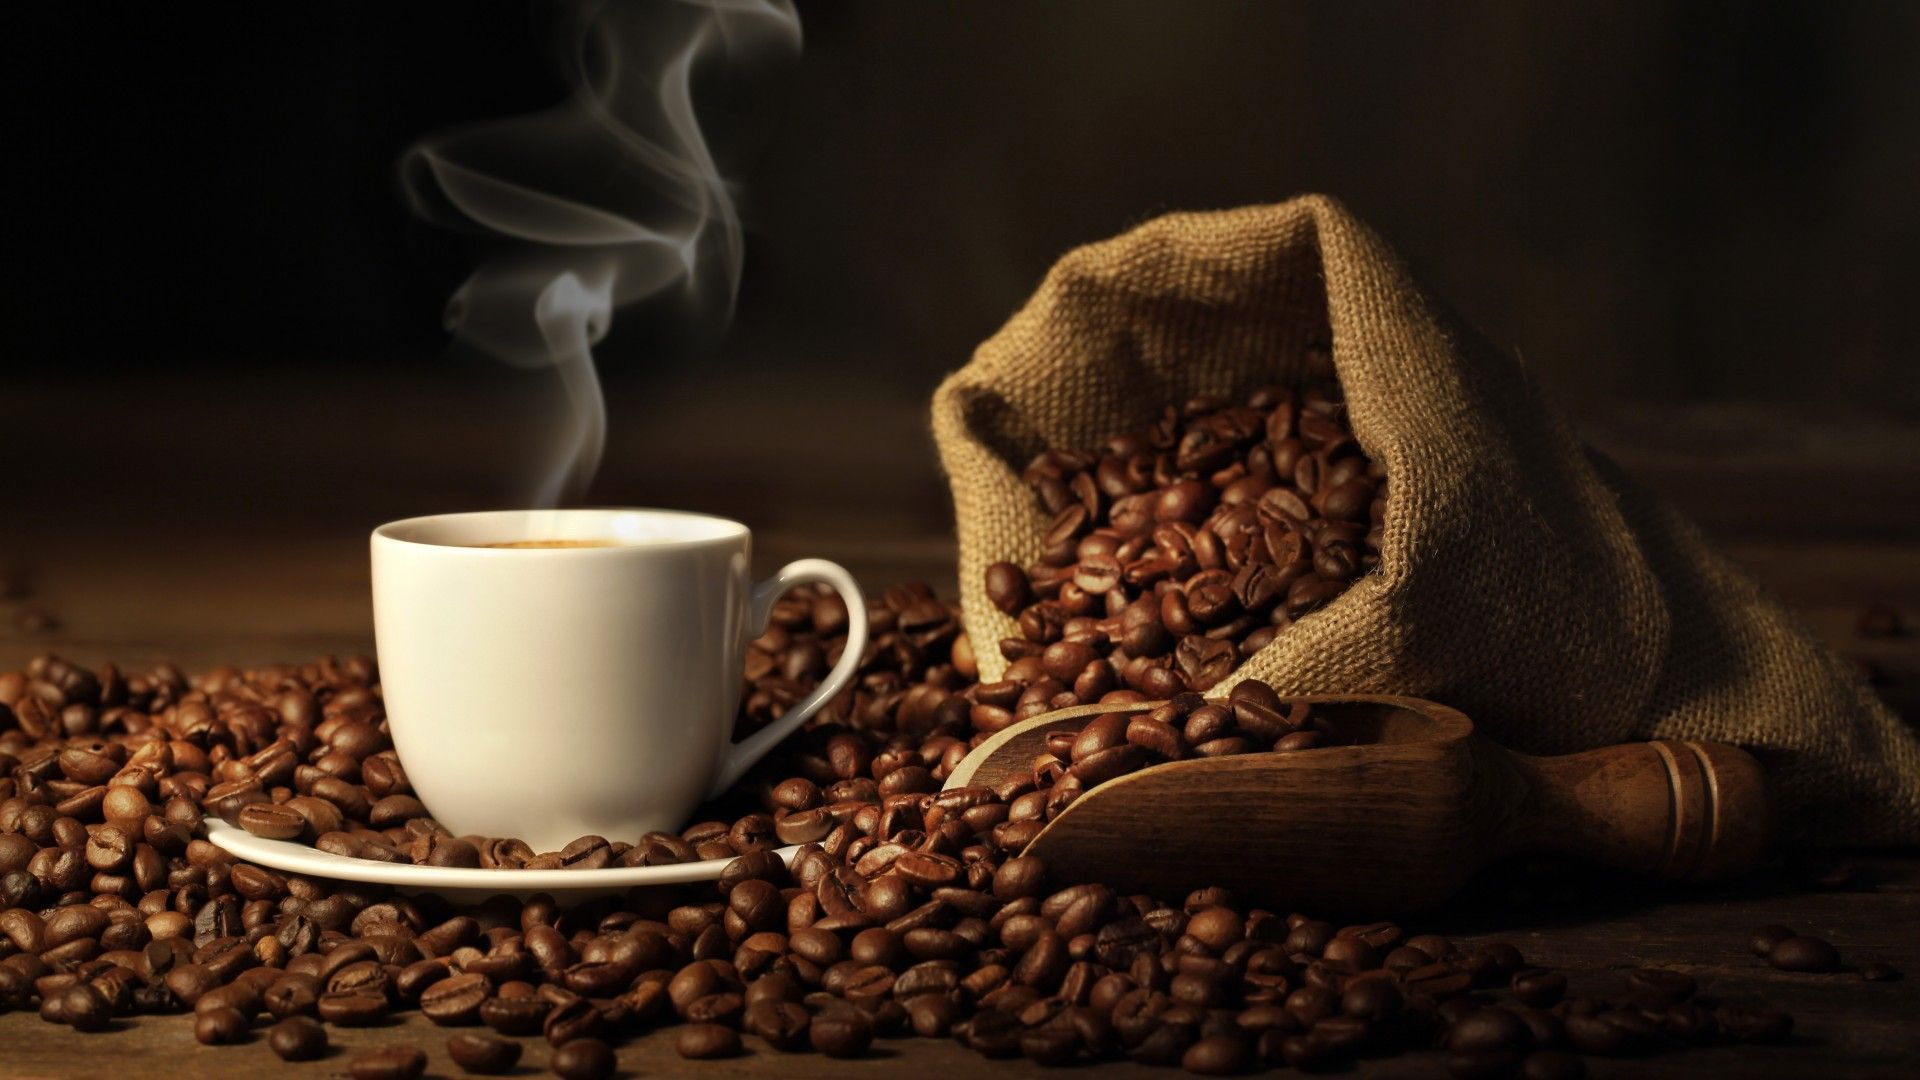 Coffee Wallpapers Full Hd 2021 Live Wallpaper Hd Coffee Wallpaper International Coffee Day Best Coffee